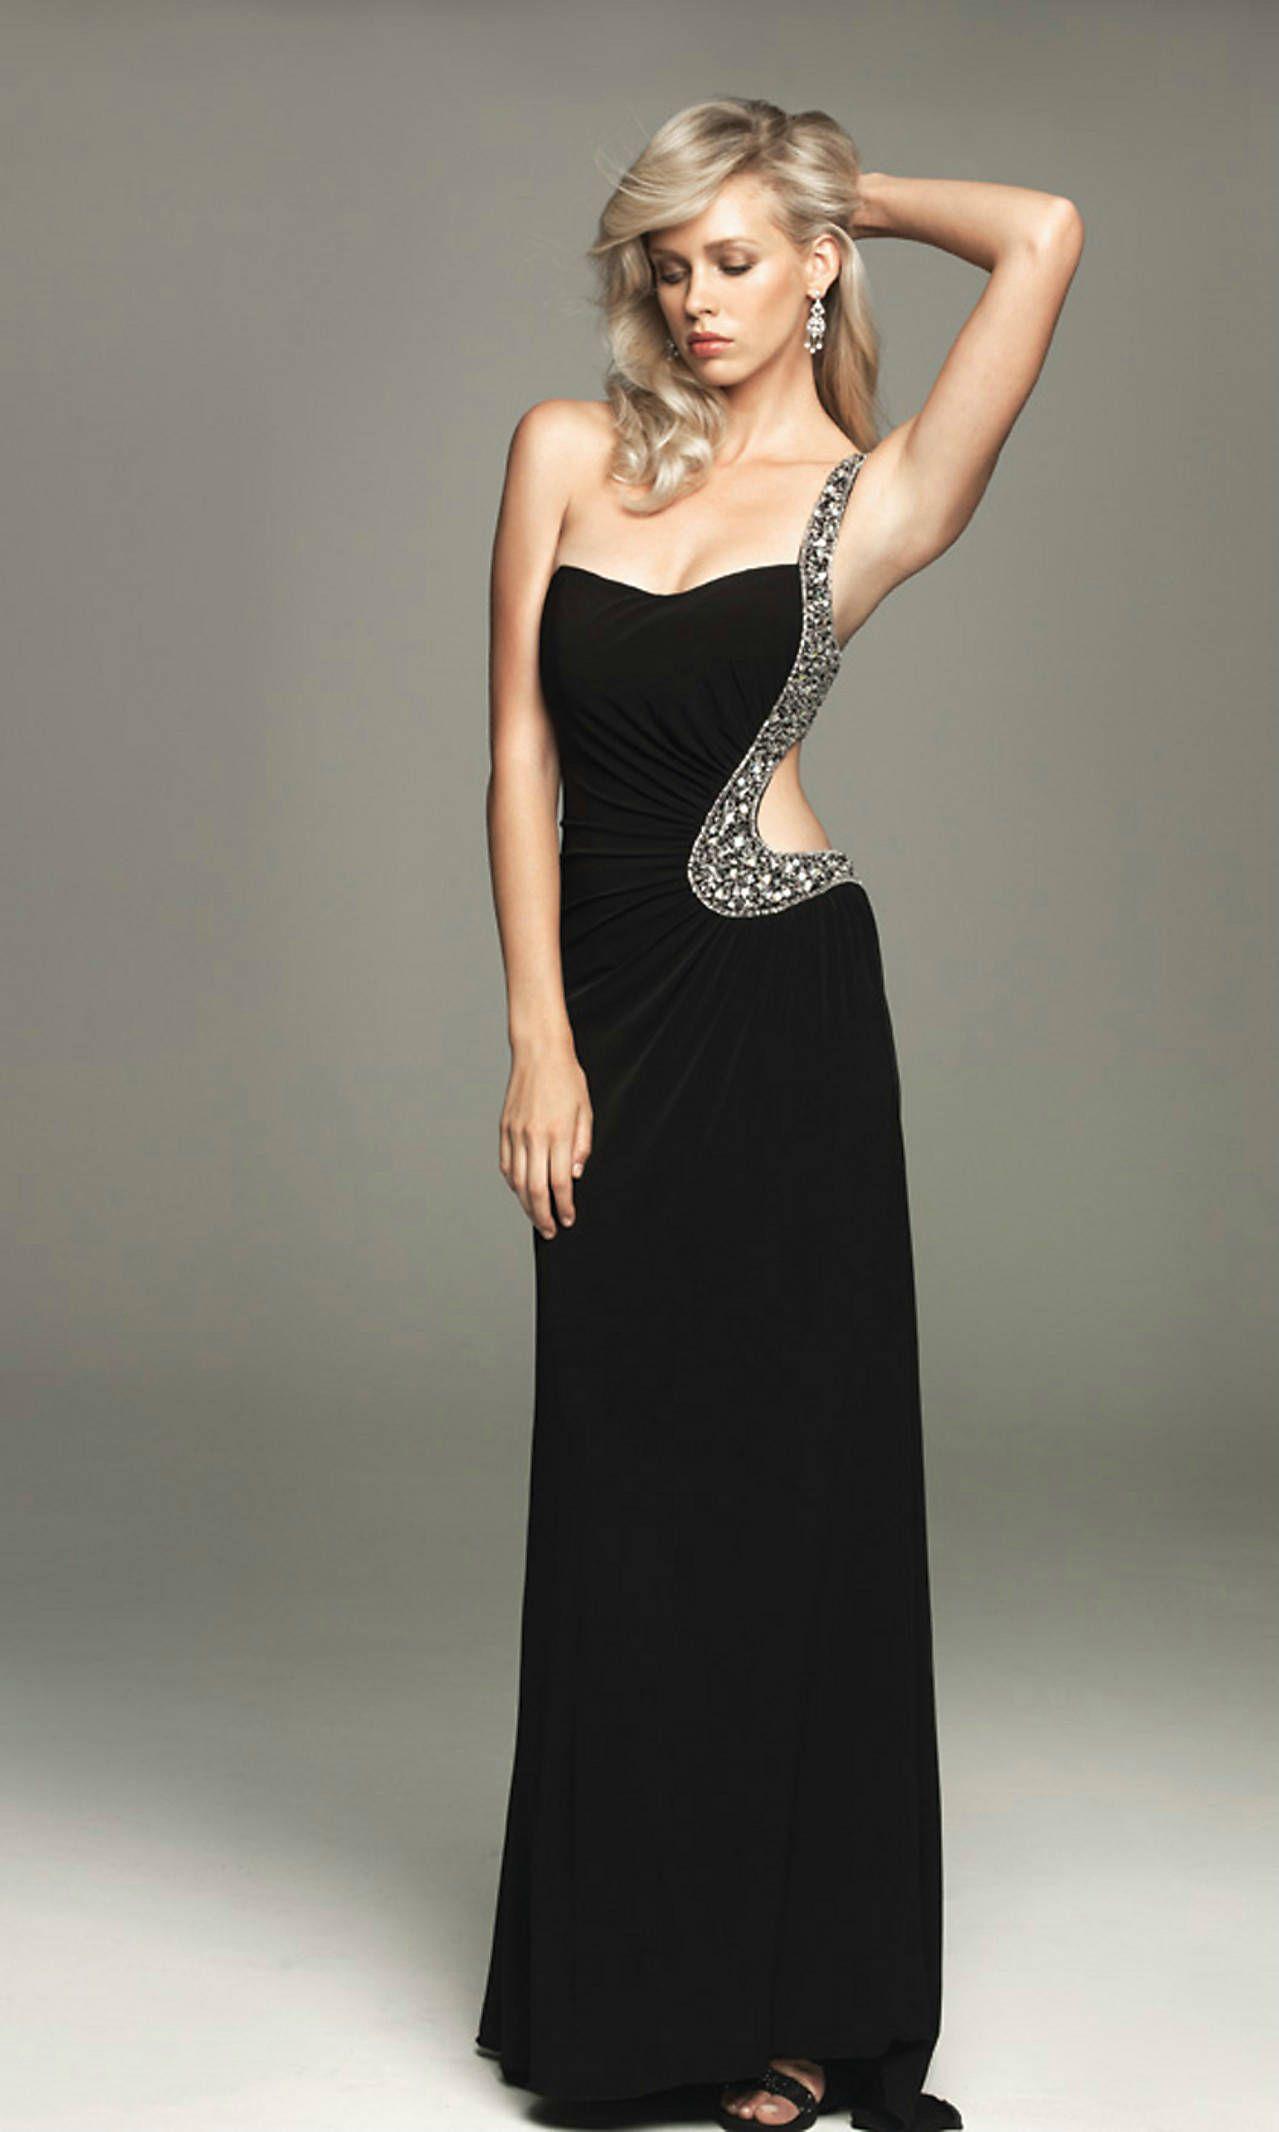 05865edc6 One Shoulder Long Cut Out Back Elegant Ruched Rhinestone Black Dress ...